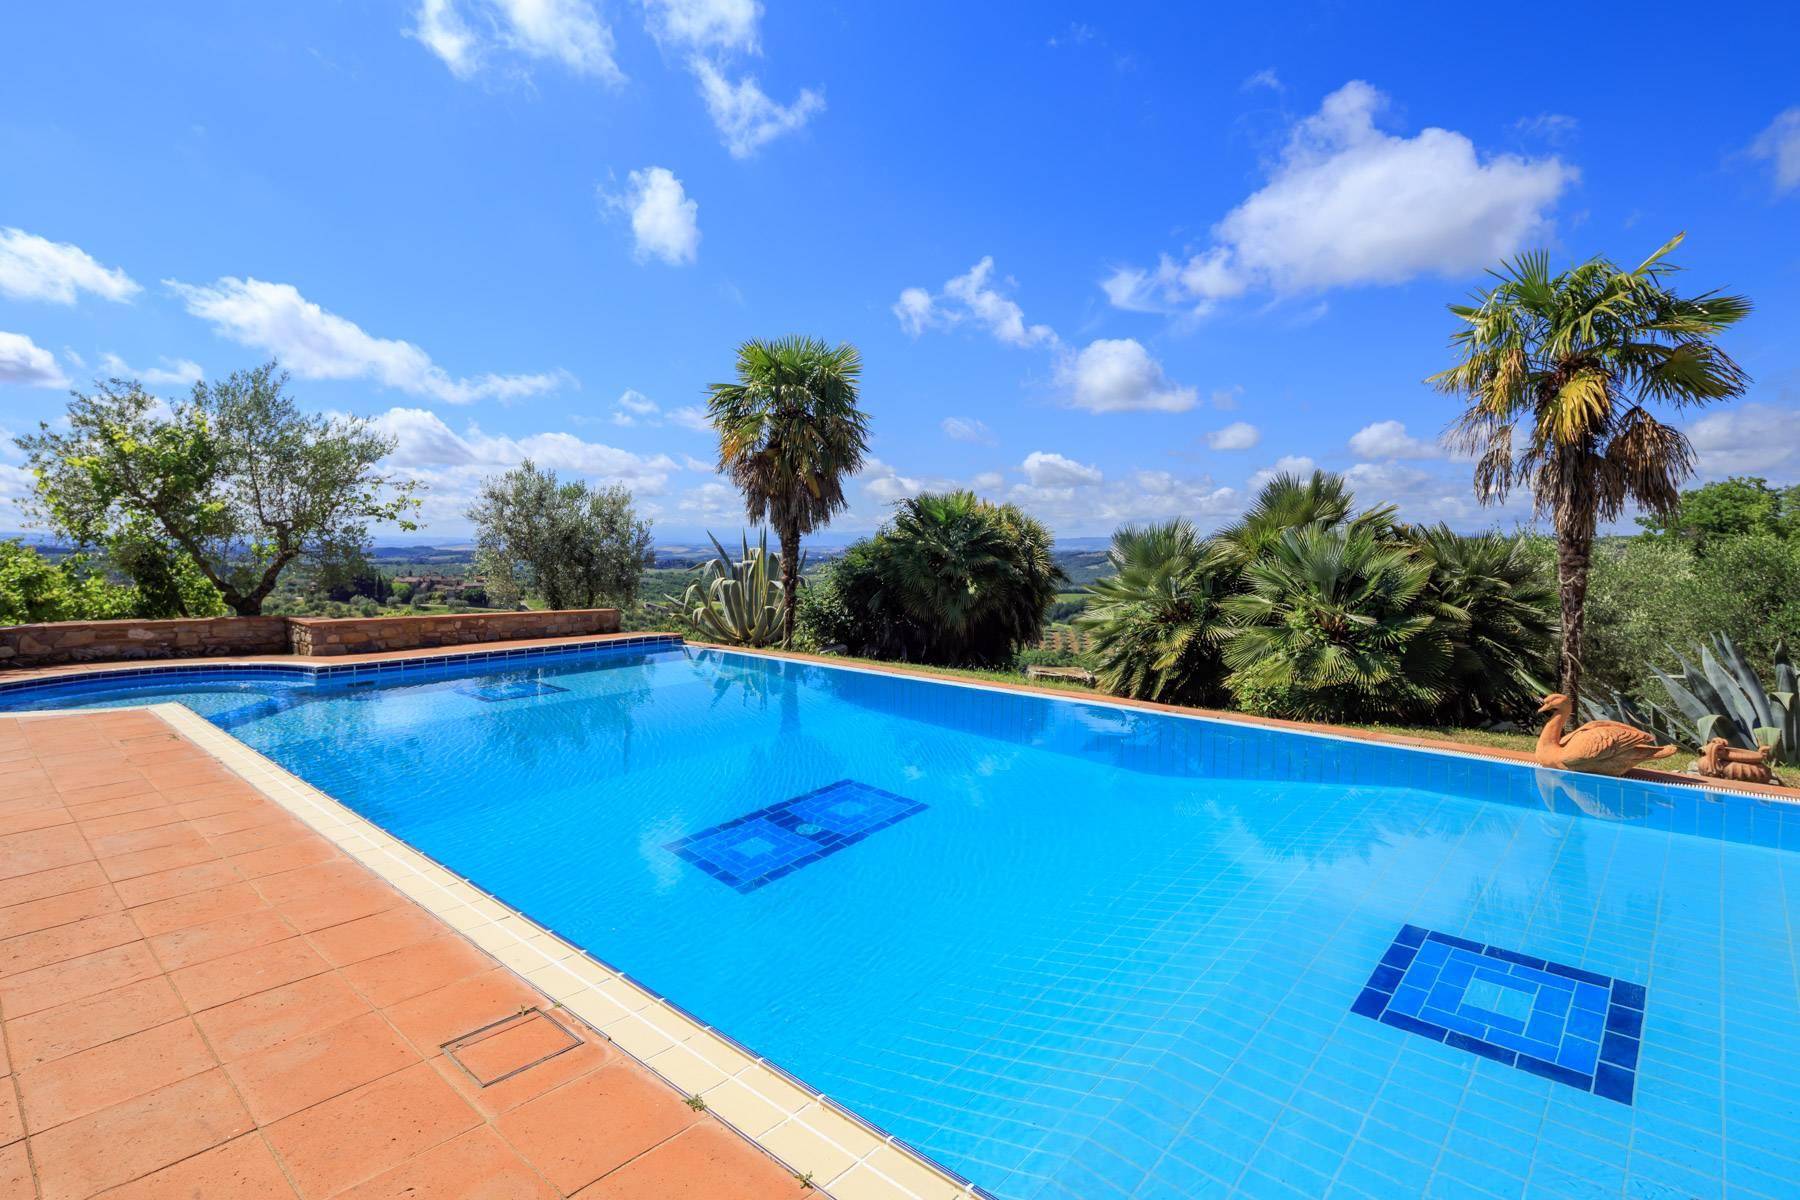 Villa in Vendita a Gaiole In Chianti: 5 locali, 465 mq - Foto 5